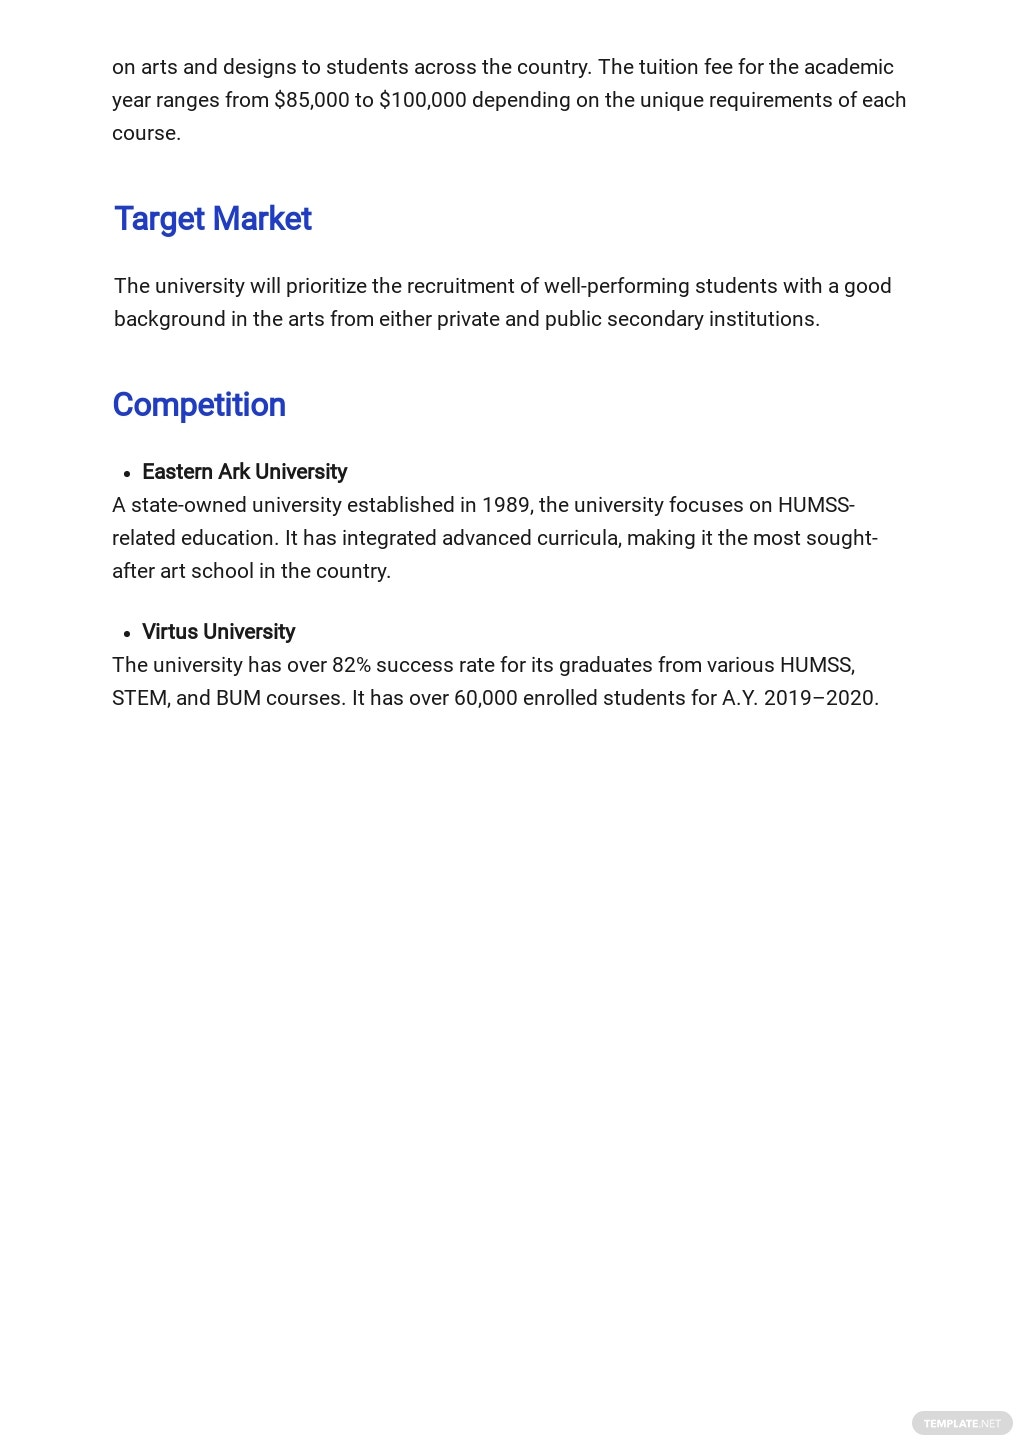 Free Sample University Business Plan Template 2.jpe